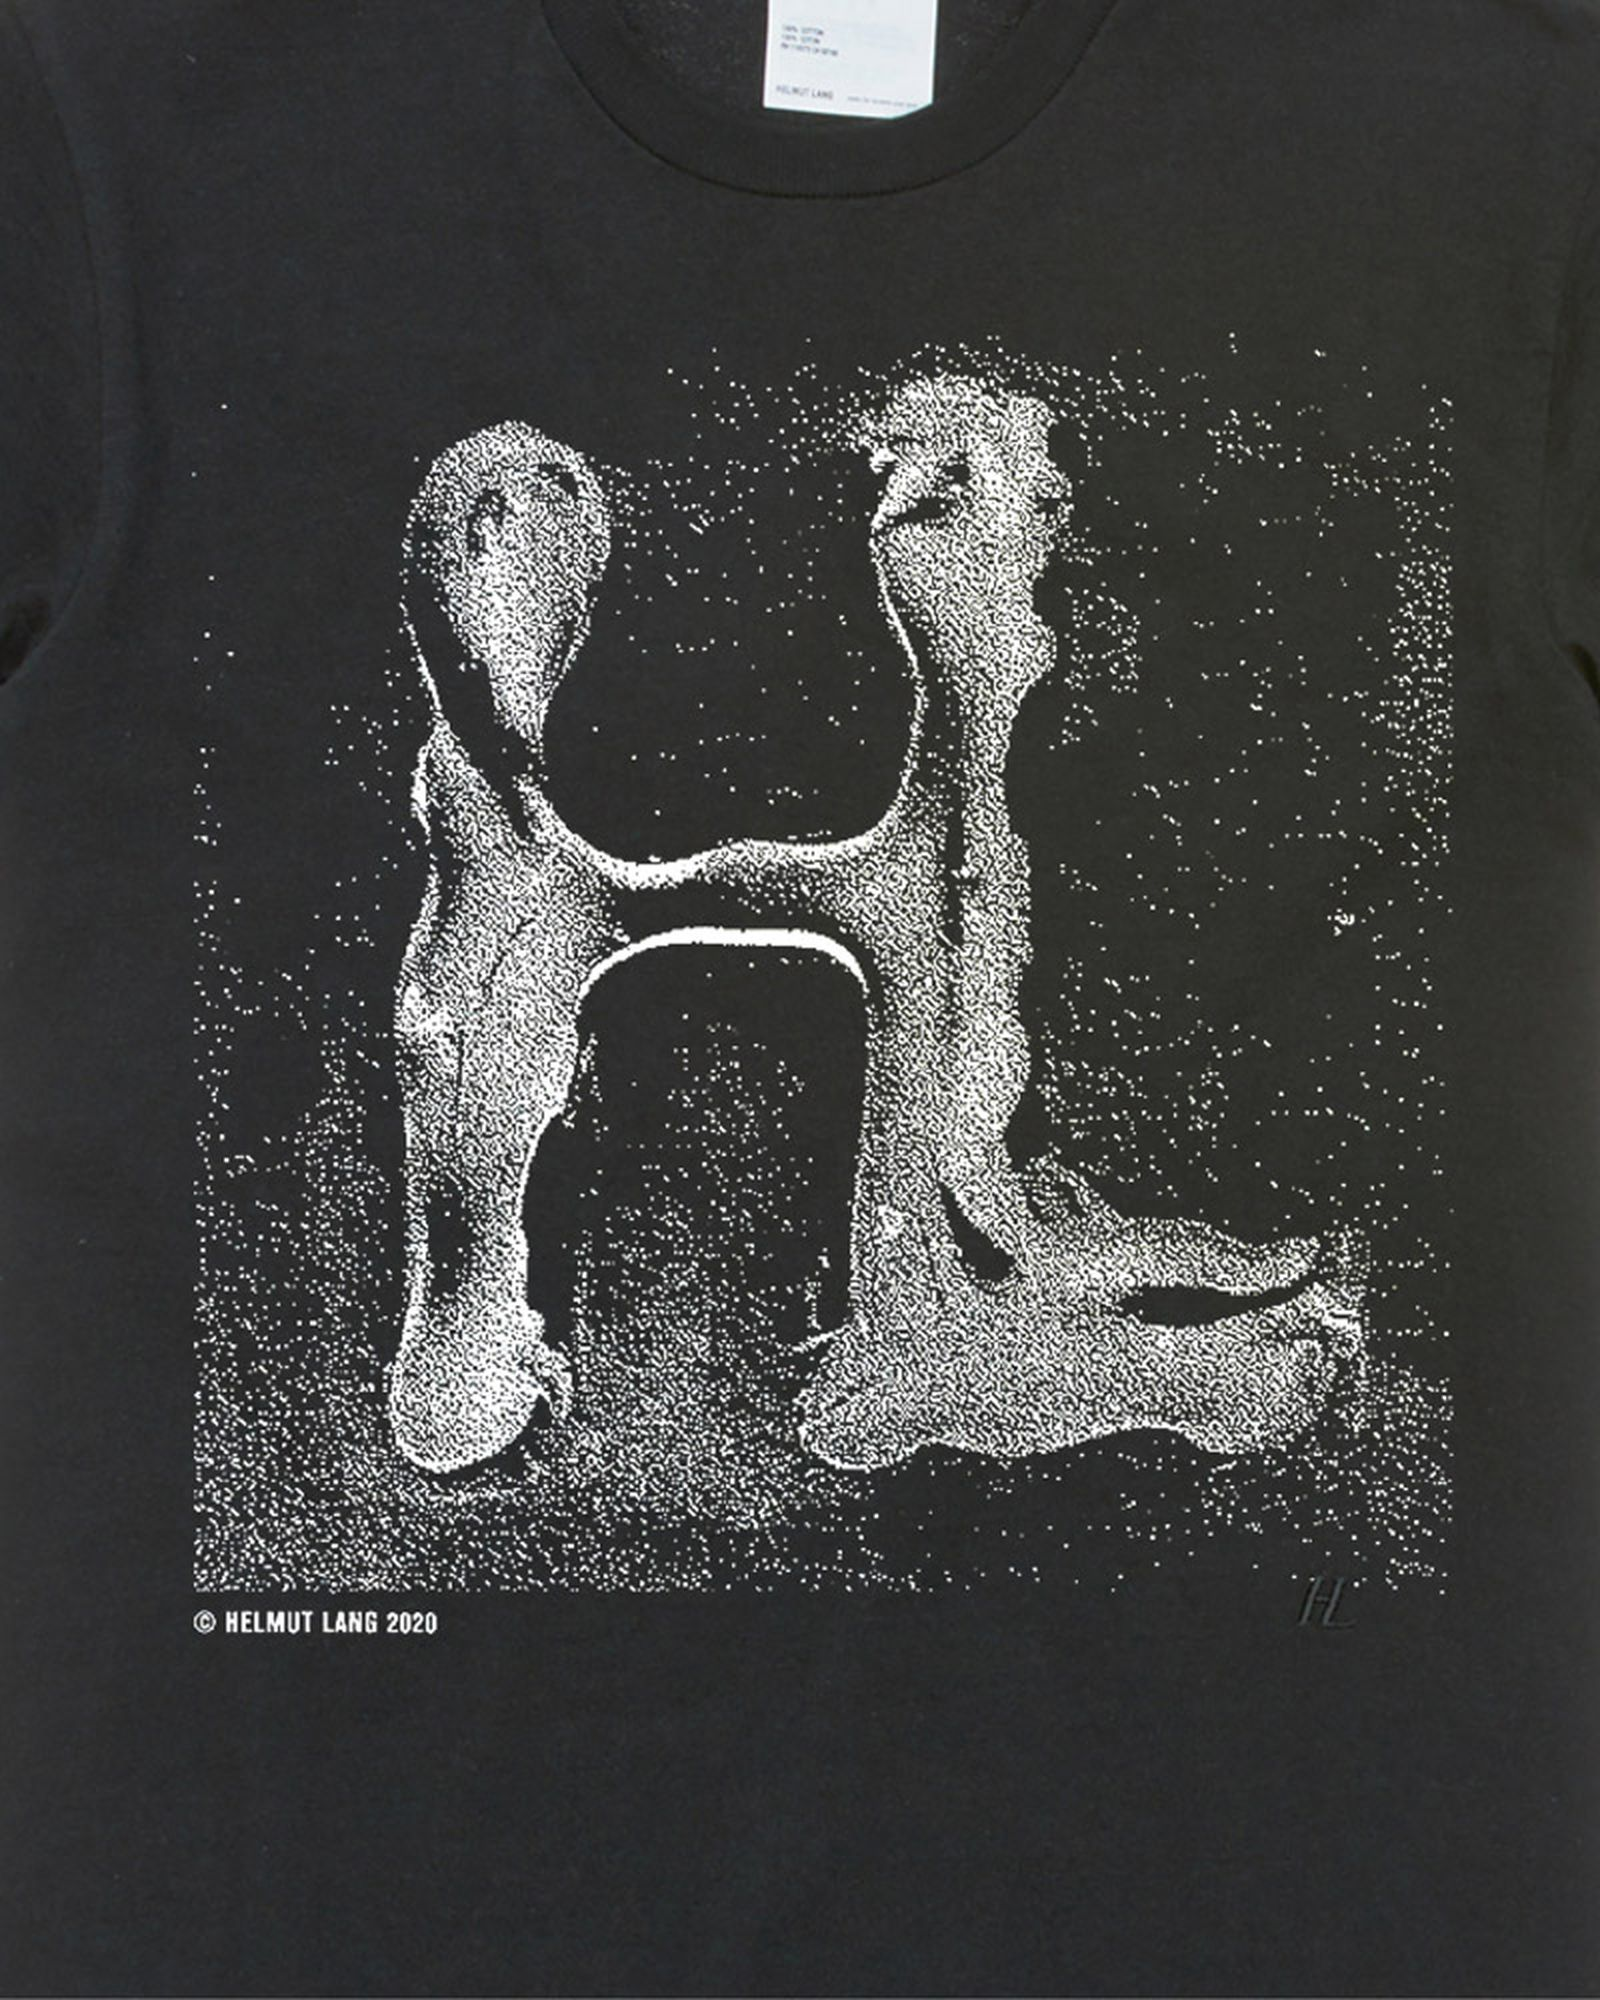 8helmut-lang-t-shirt-design-competition